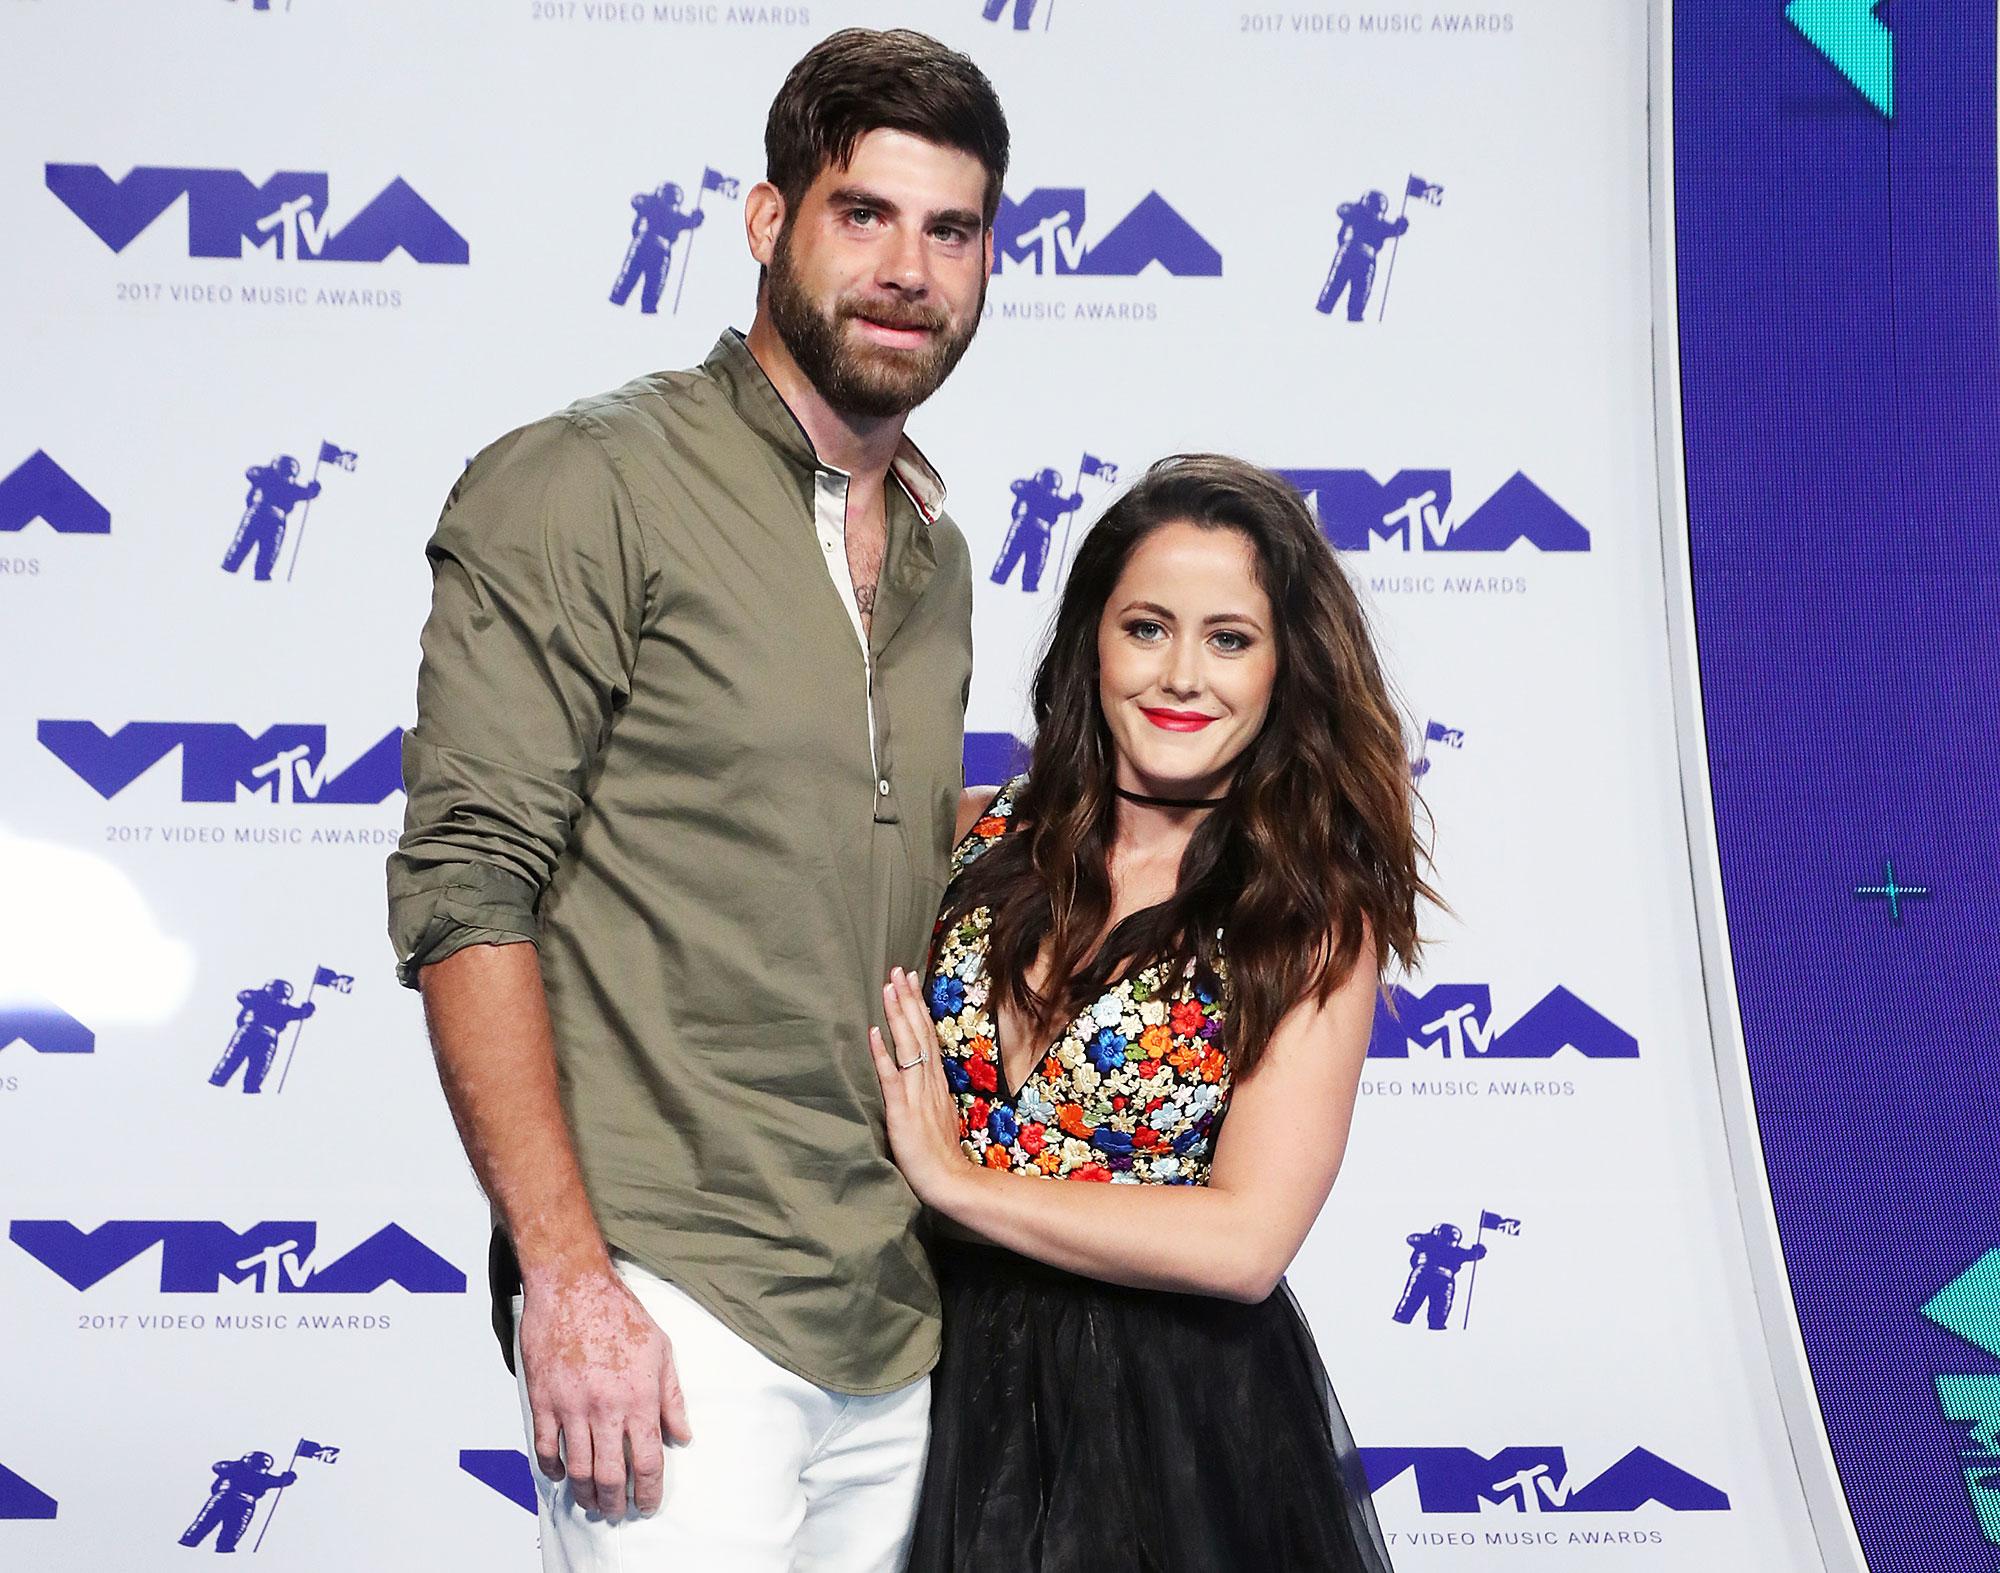 Jenelle Evans Husband David Eason Is Super Scared for Sons Safety With Ex Olivia Leedham